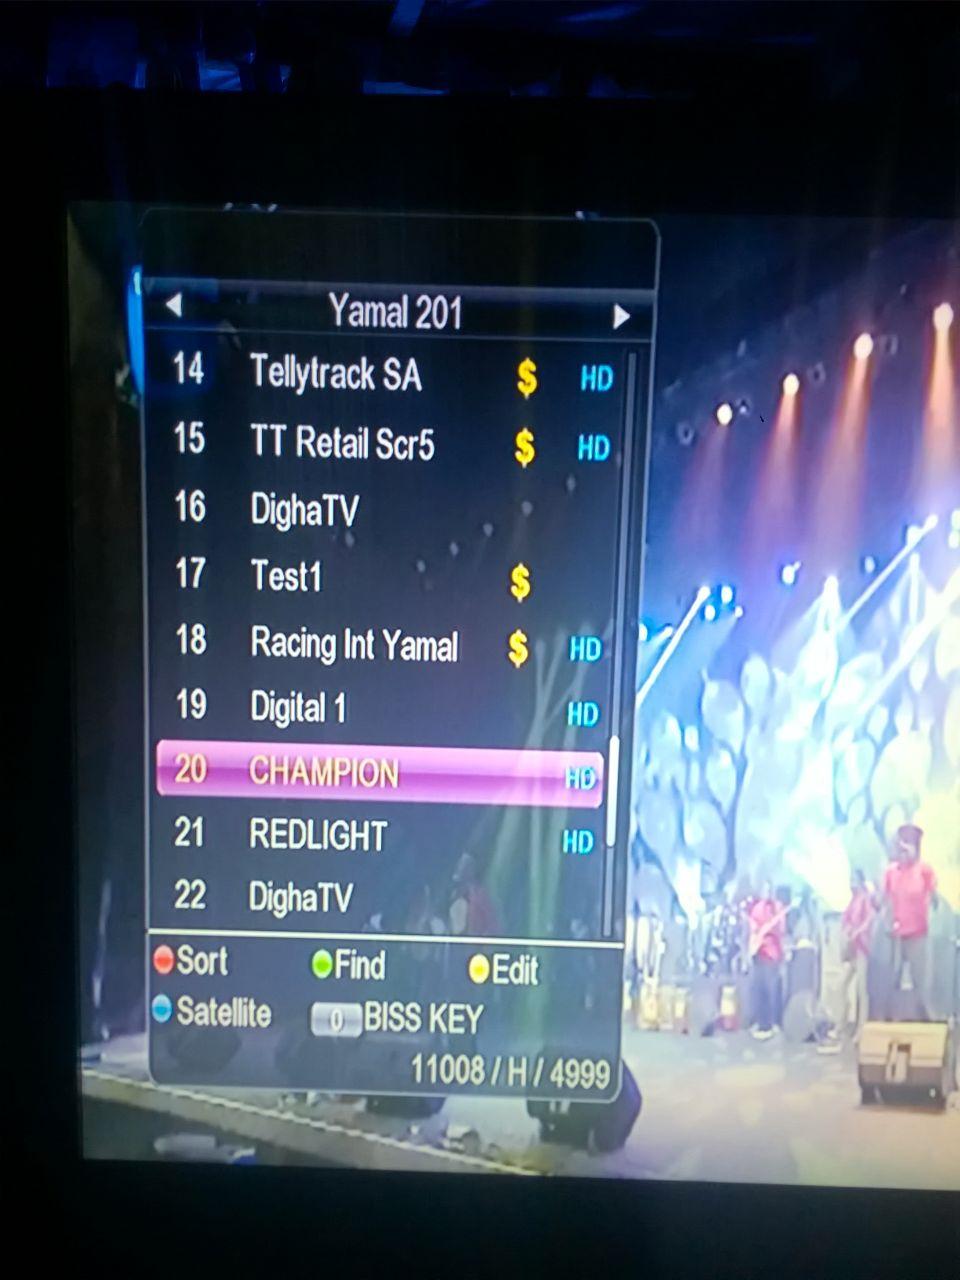 Champion tv transponder